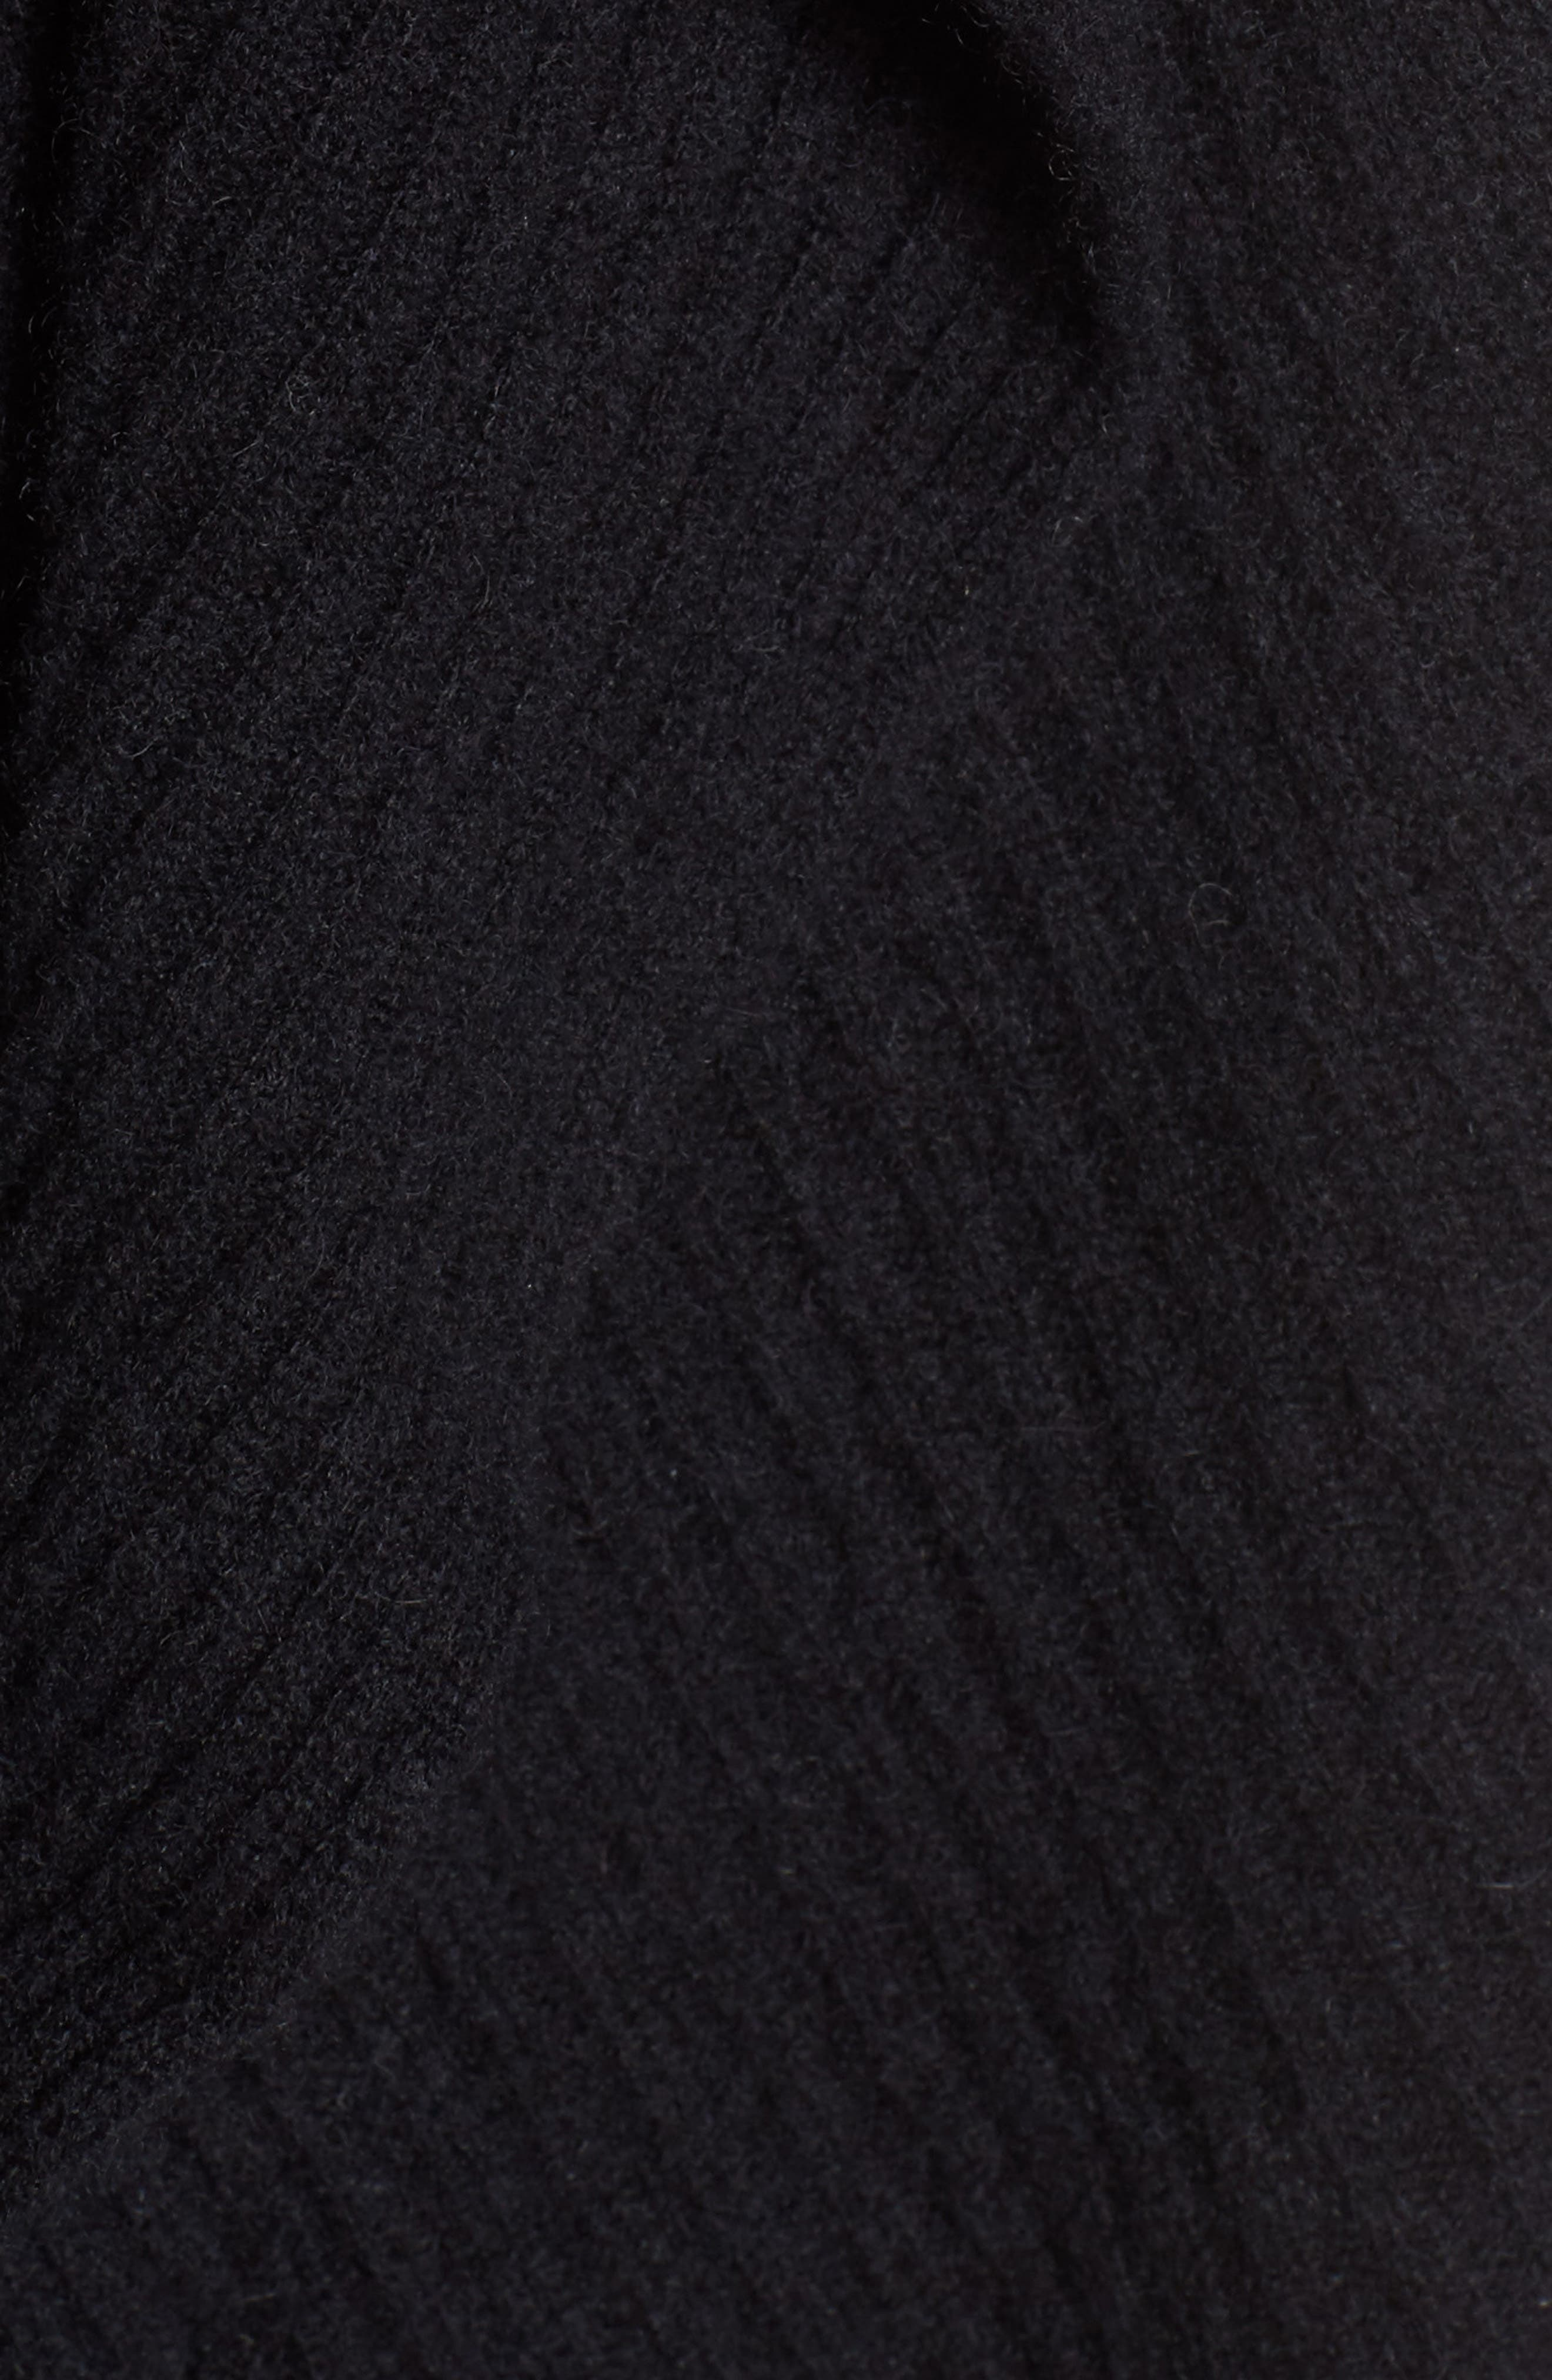 Cashmere Ruffle Wrap,                             Alternate thumbnail 5, color,                             BLACK